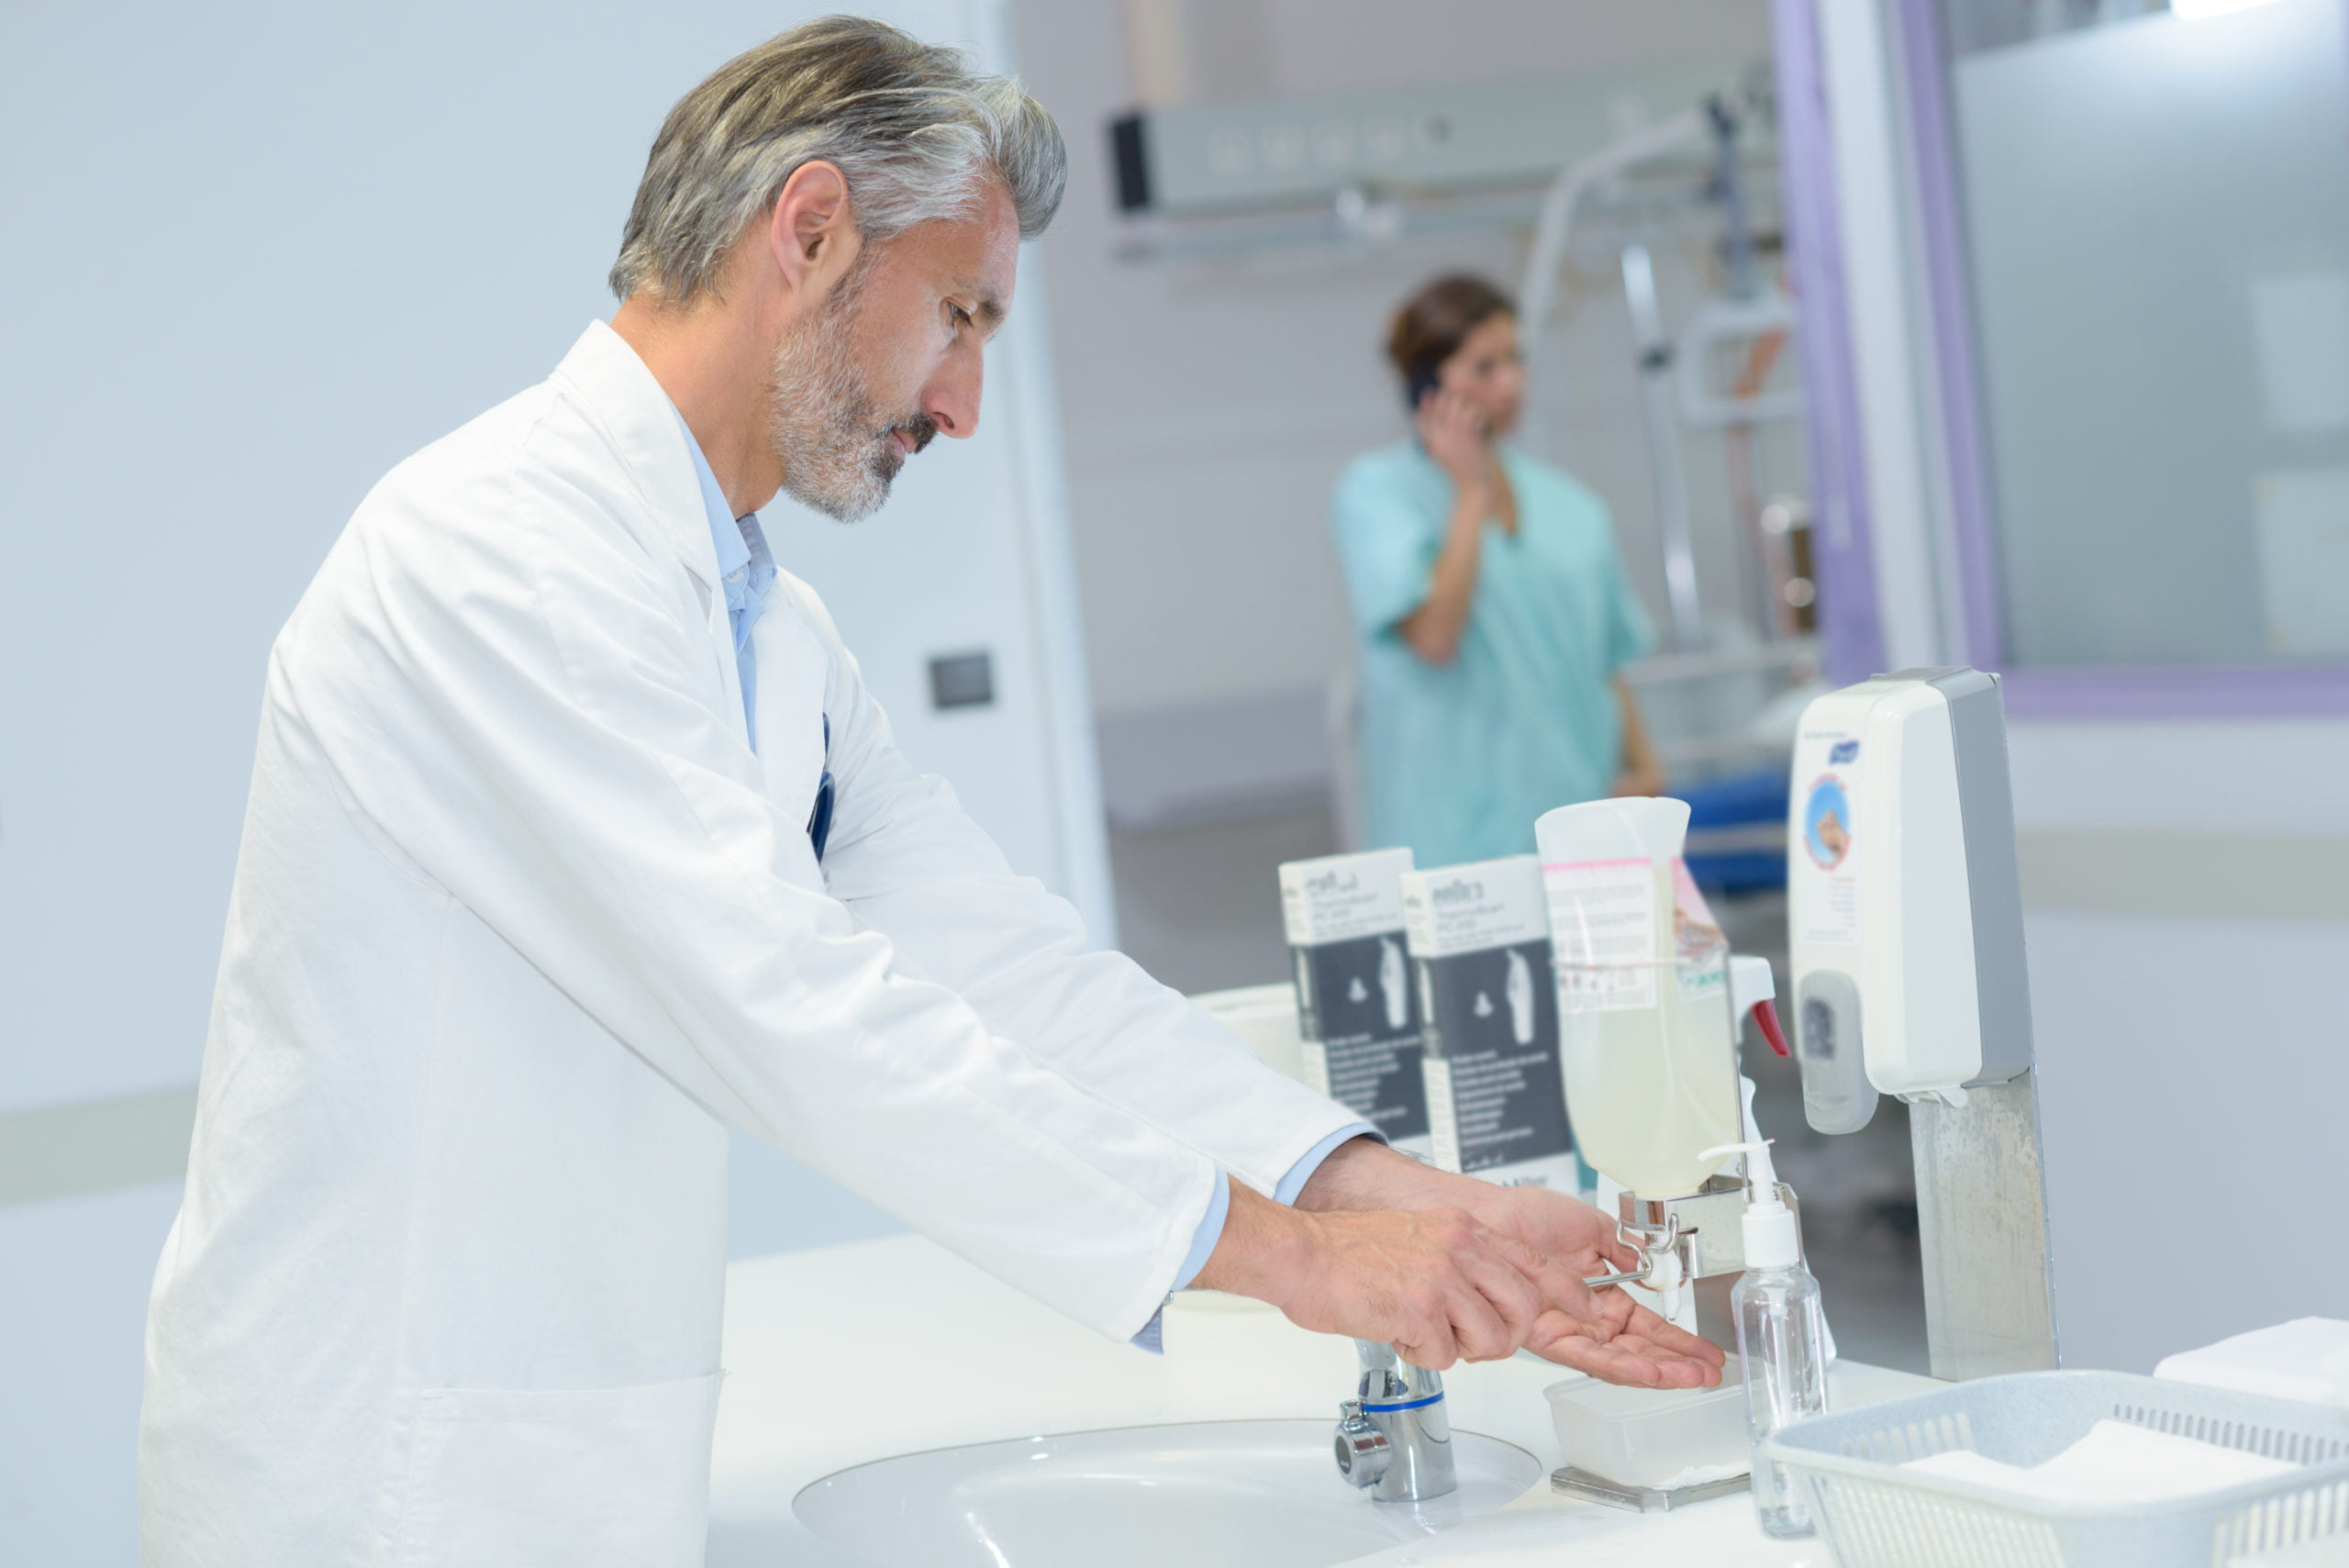 Doctor sanitising hands